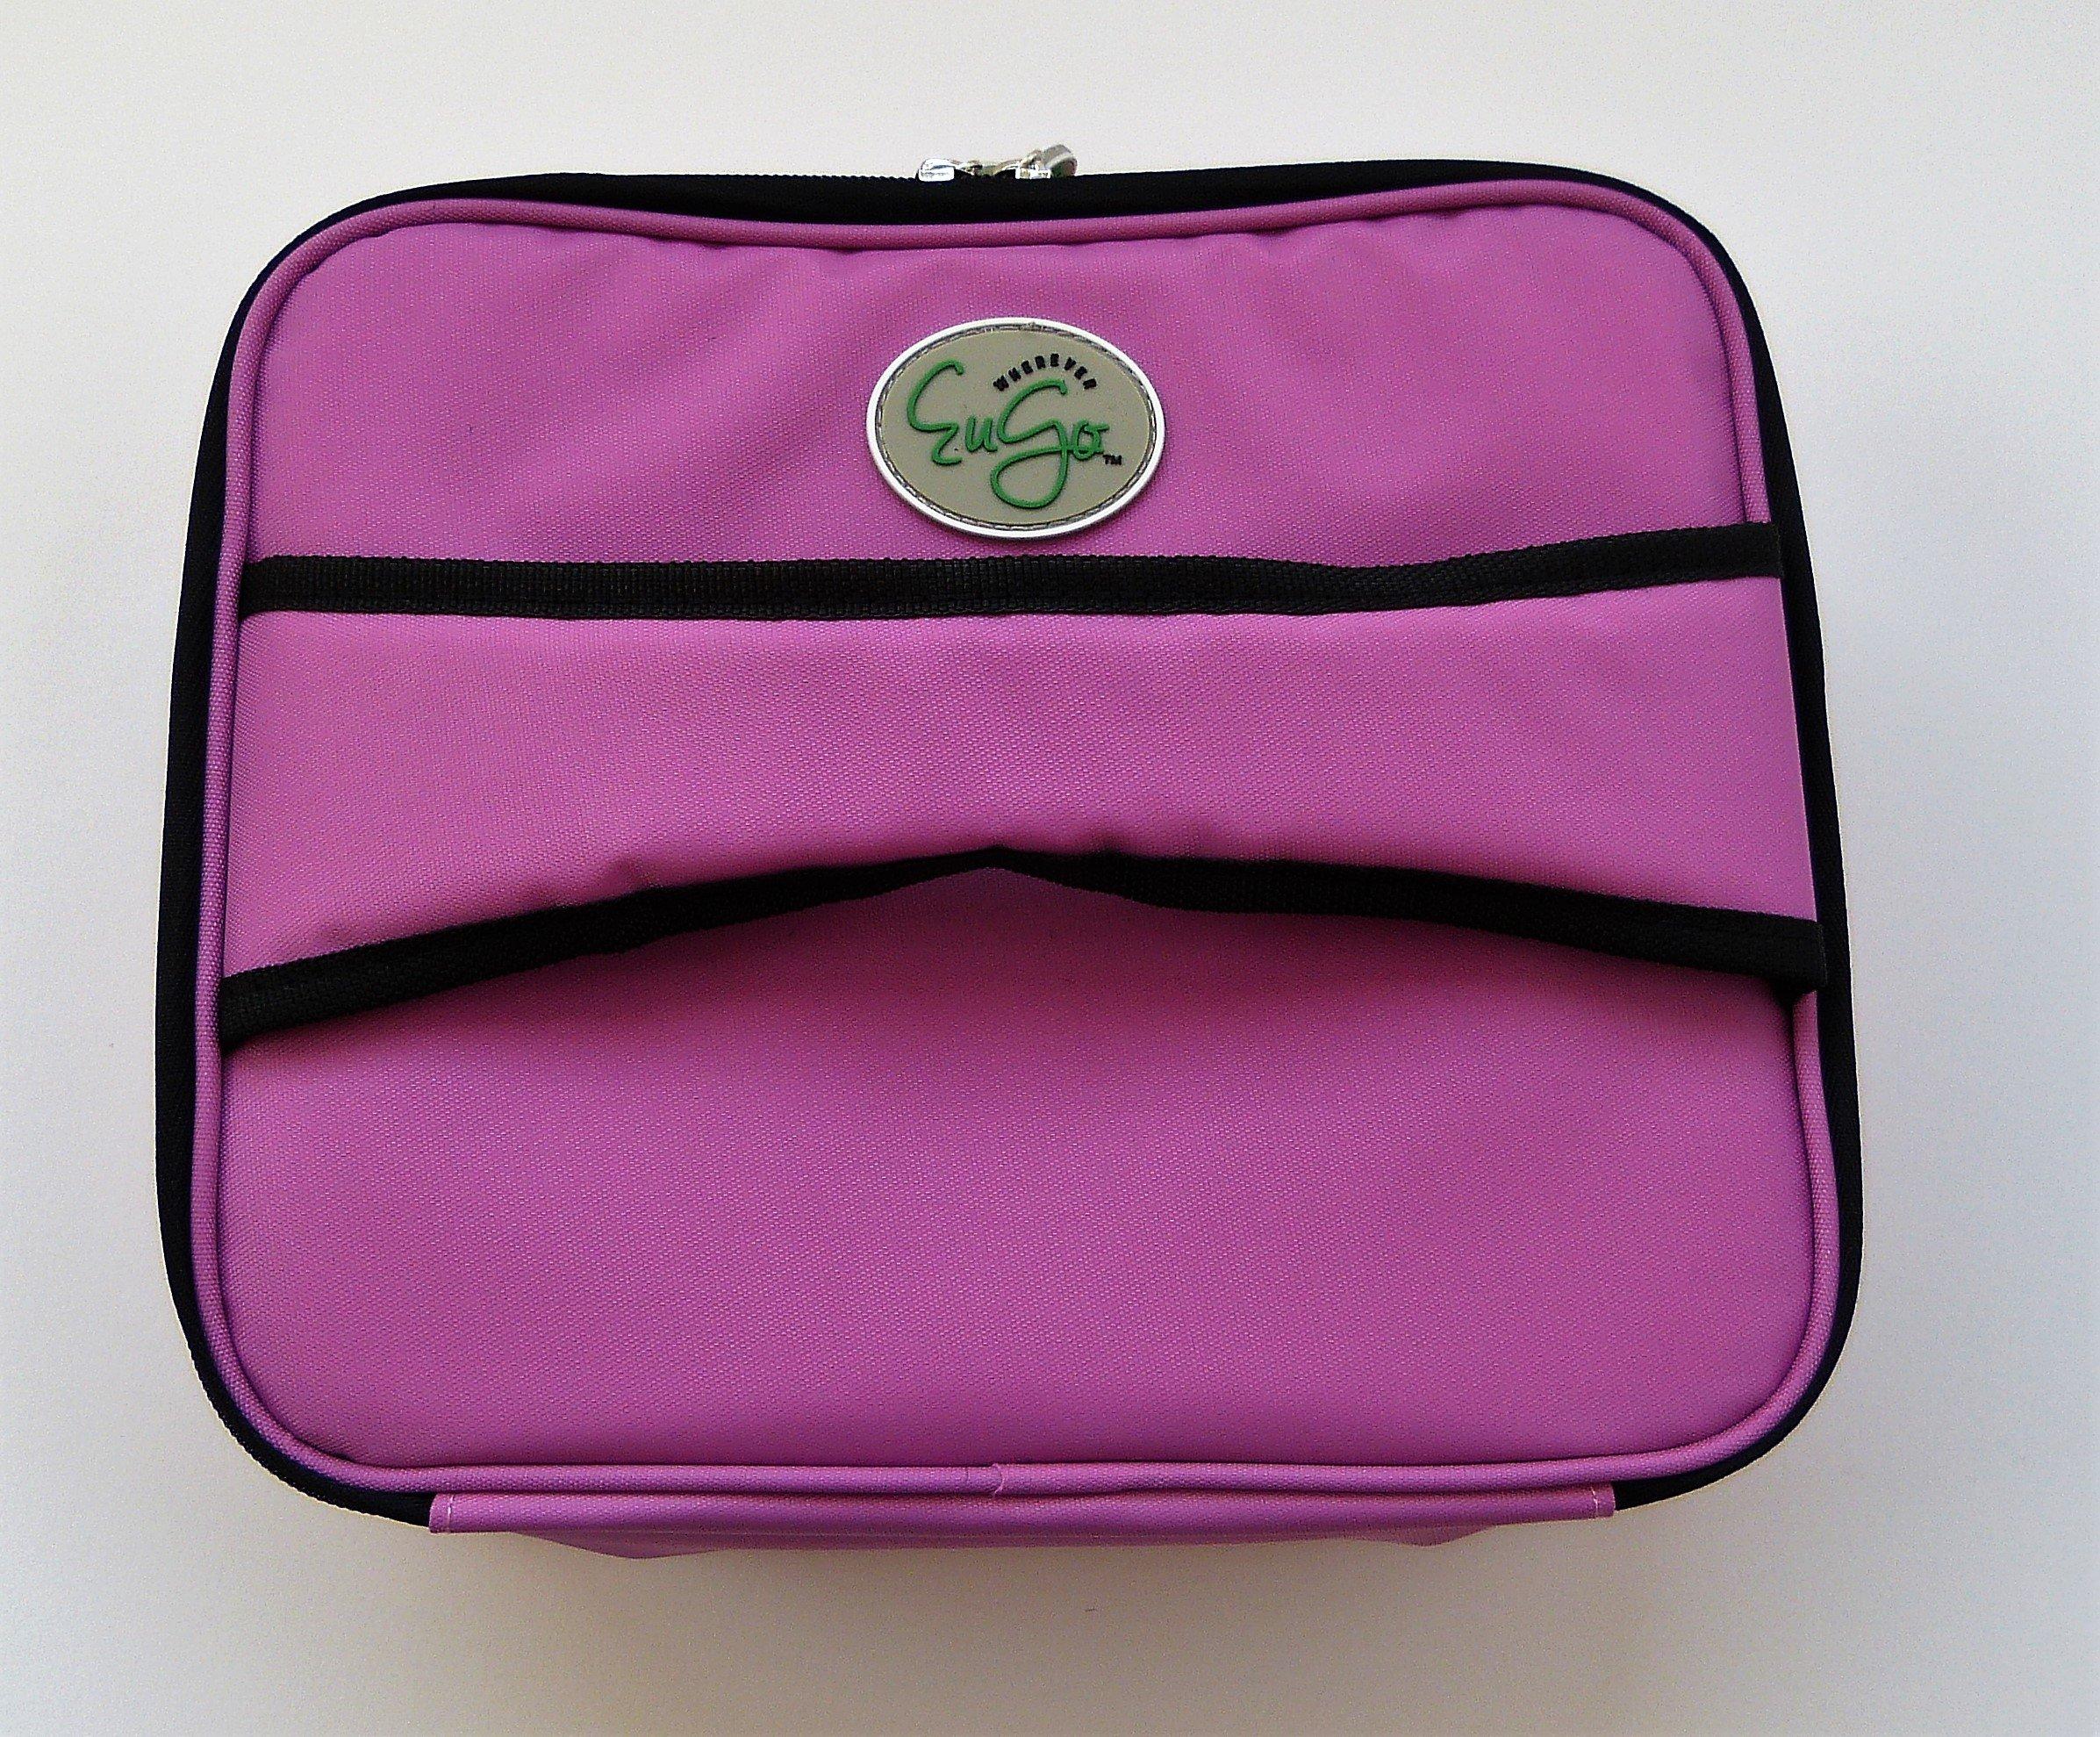 Diabetes Supplies Travel Bag and Organizer - Sport Pink